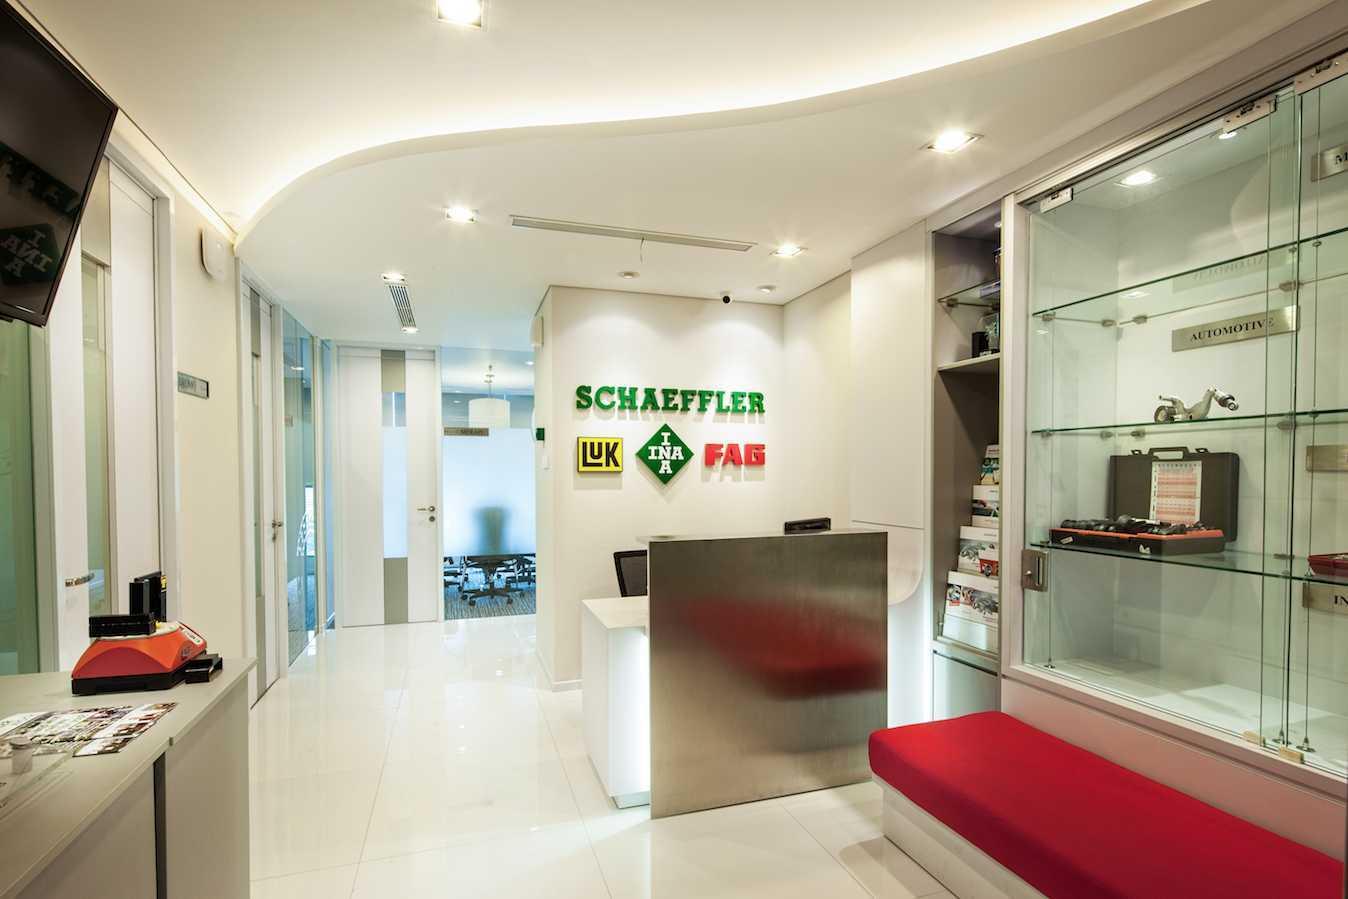 Foto inspirasi ide desain lobby skandinavia Reception area oleh PT Asa Adiguna di Arsitag